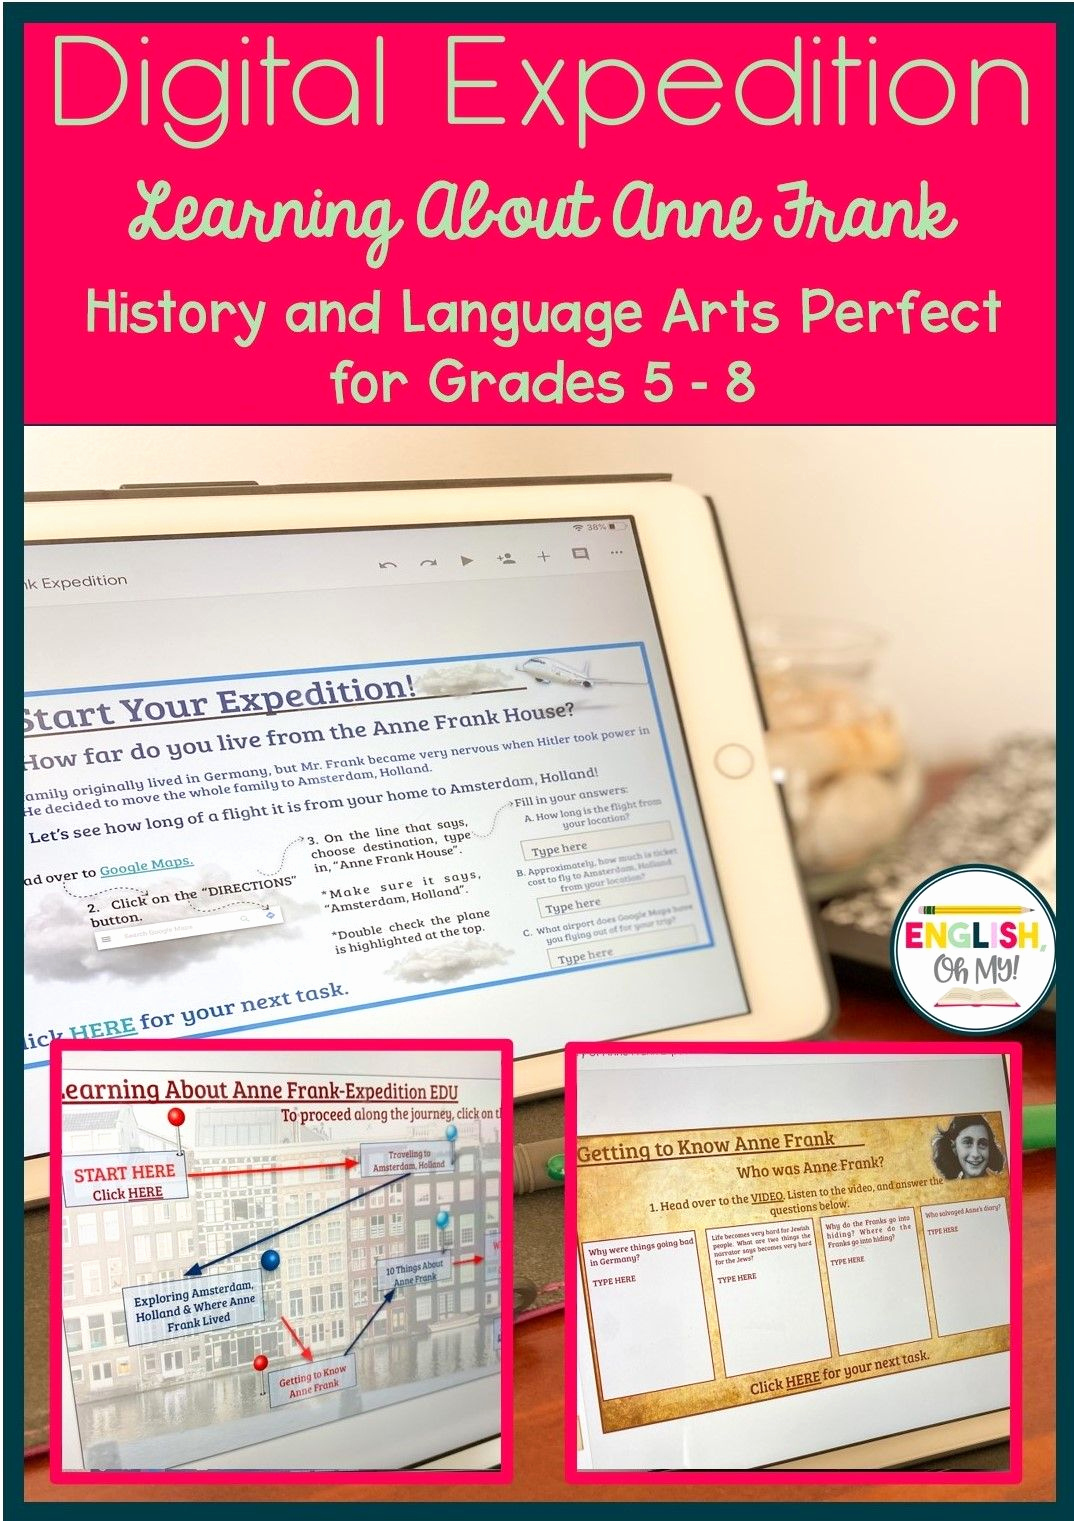 Anne Frank Worksheets Middle School Elegant Digital Expedition Learning About Anne Frank